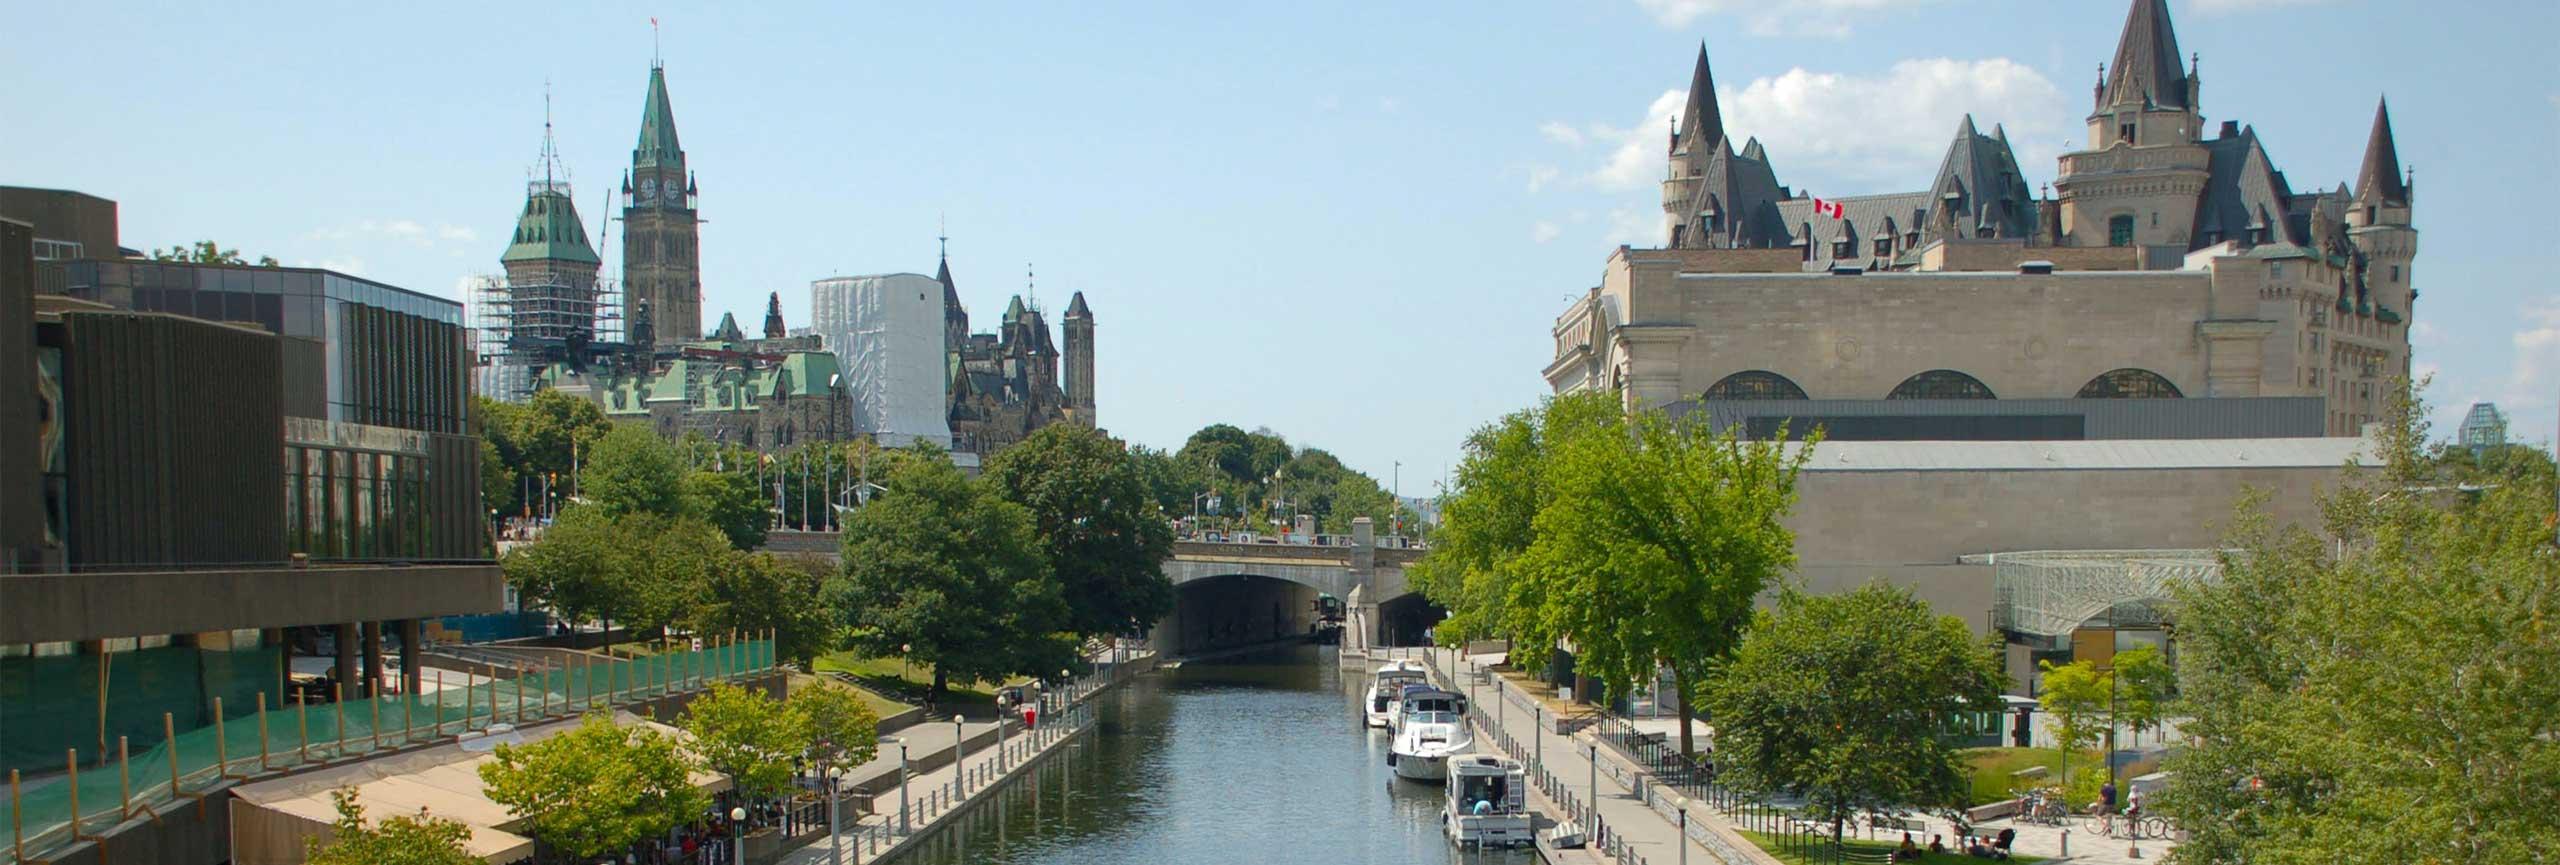 Ottawa scenery